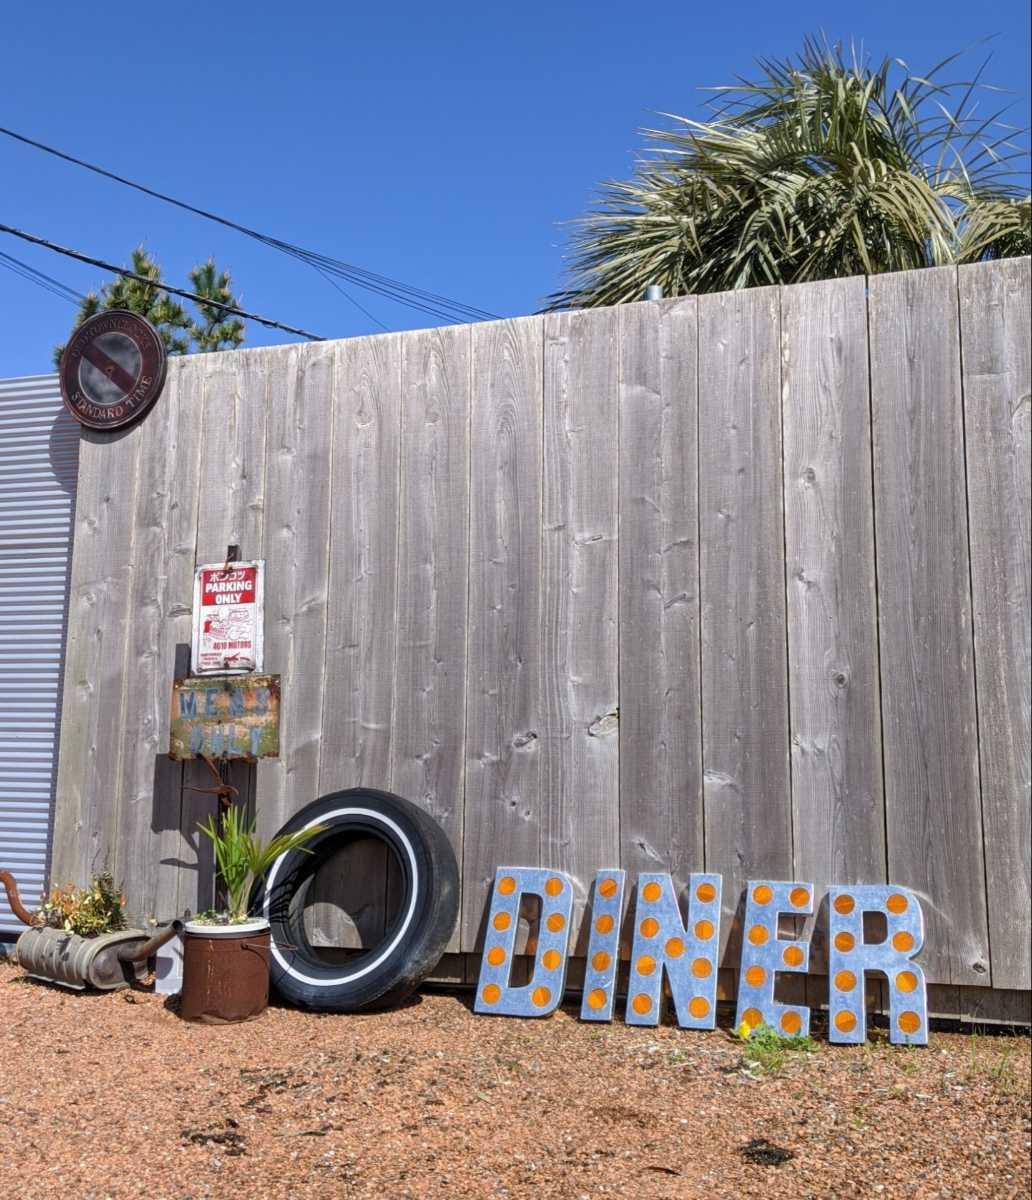 DINER SING(反射鏡付き)ダイナー 切り文字 立体看板/アメリカンヴィンテージStyle/#店舗什器#アメリカンダイナー#レストラン#壁面看板_画像2